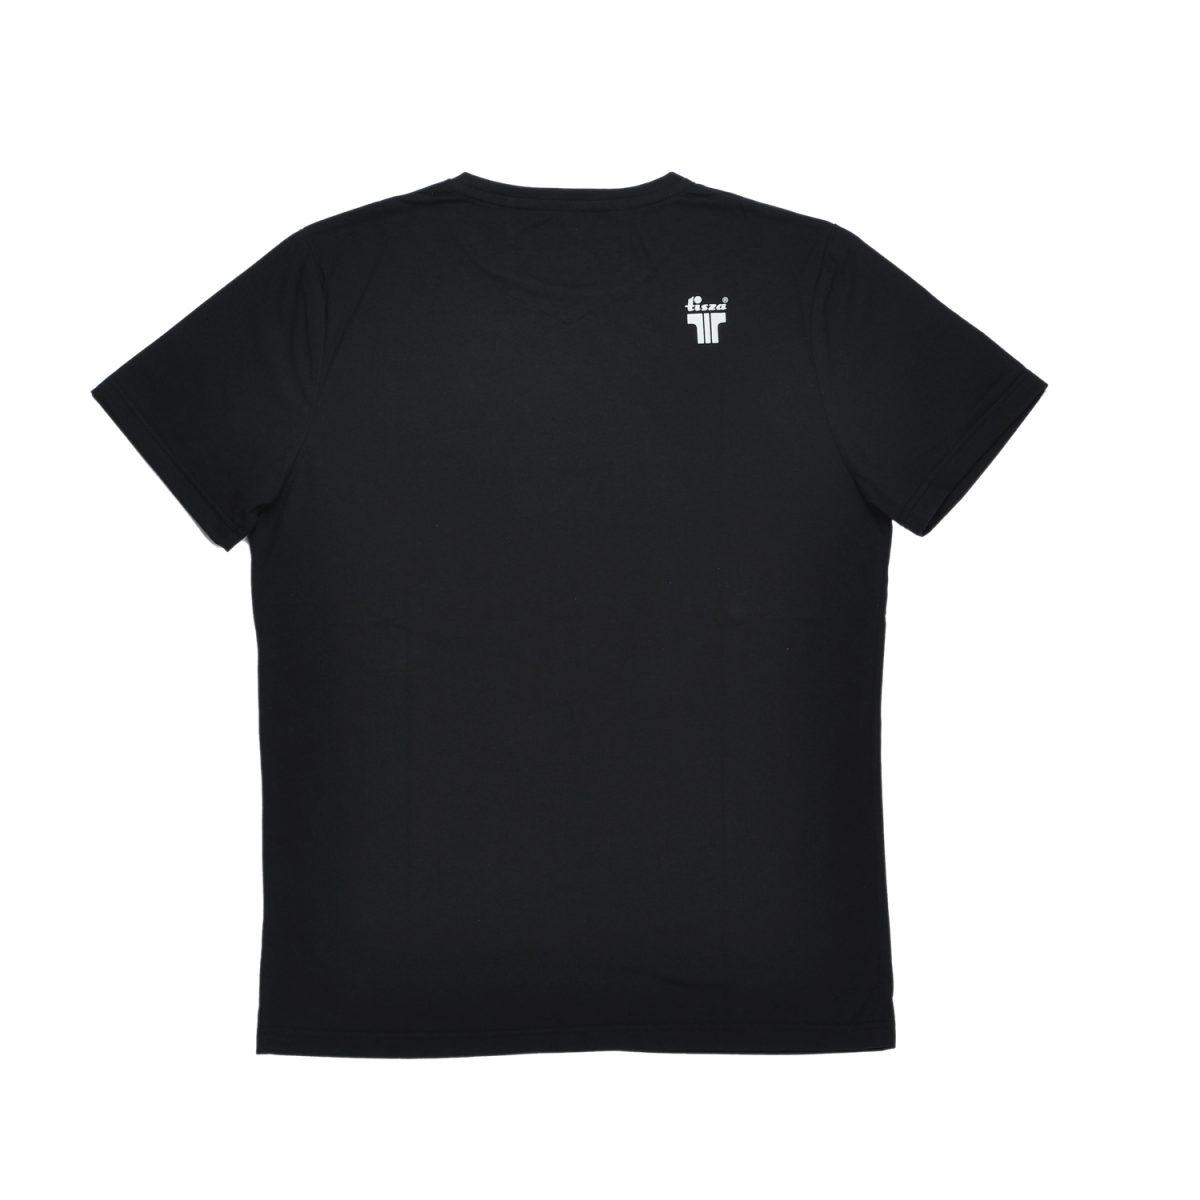 Tisza shoes - T-shirt - Black written